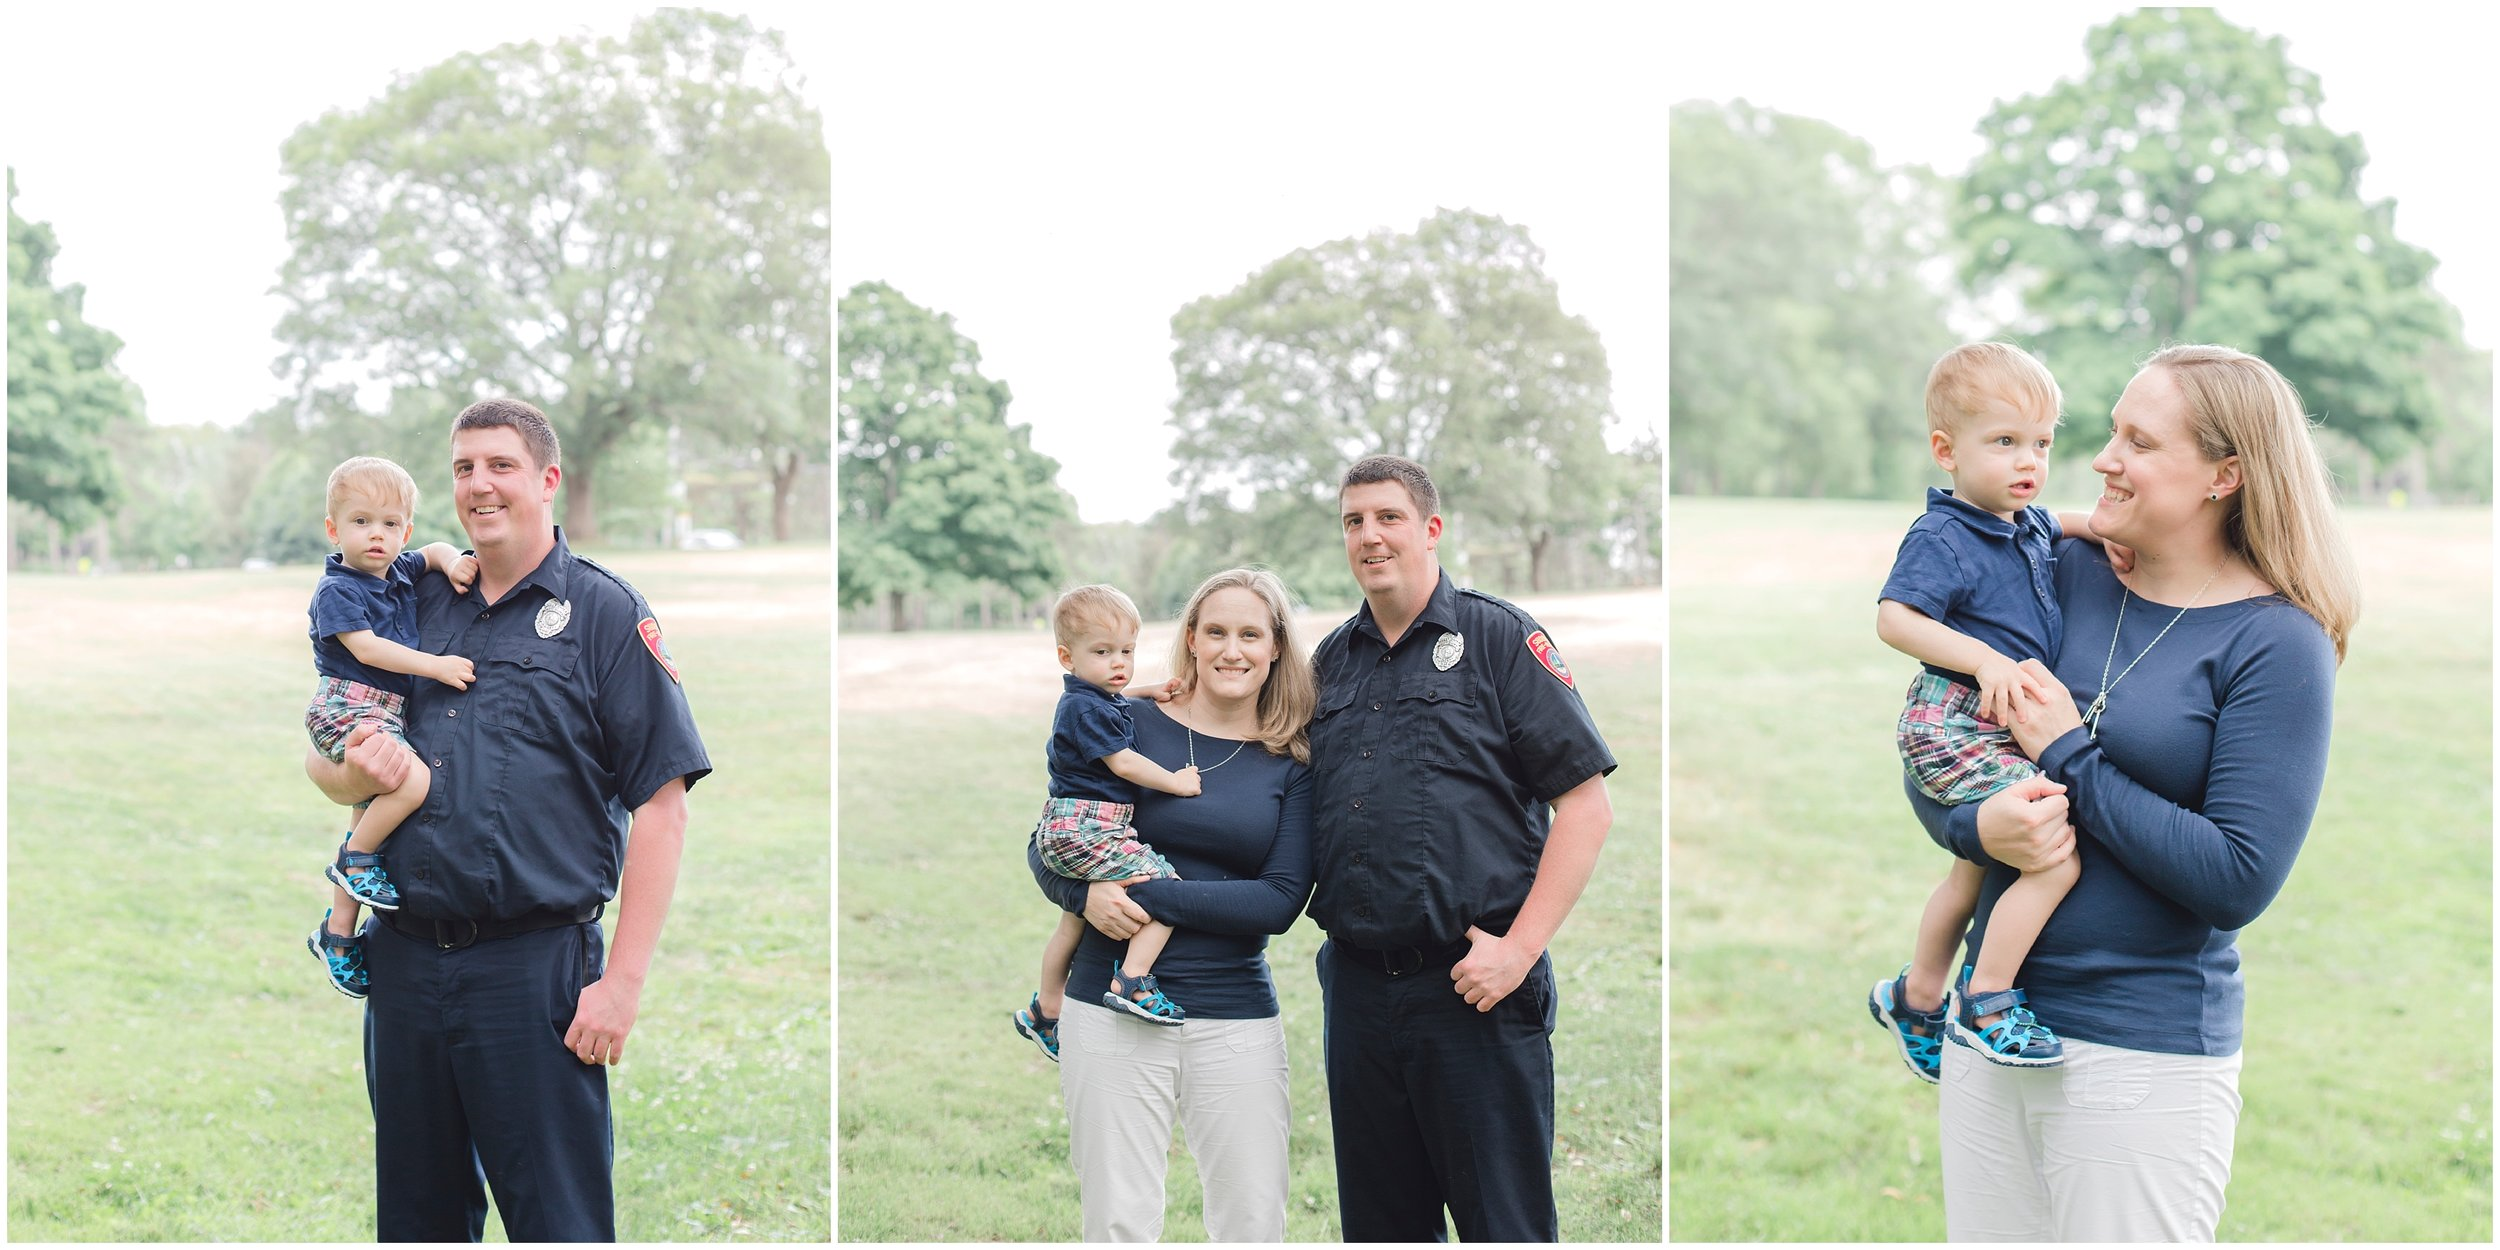 Public_safety_family_photos_framingham_erica_pezente_photography (3).jpg